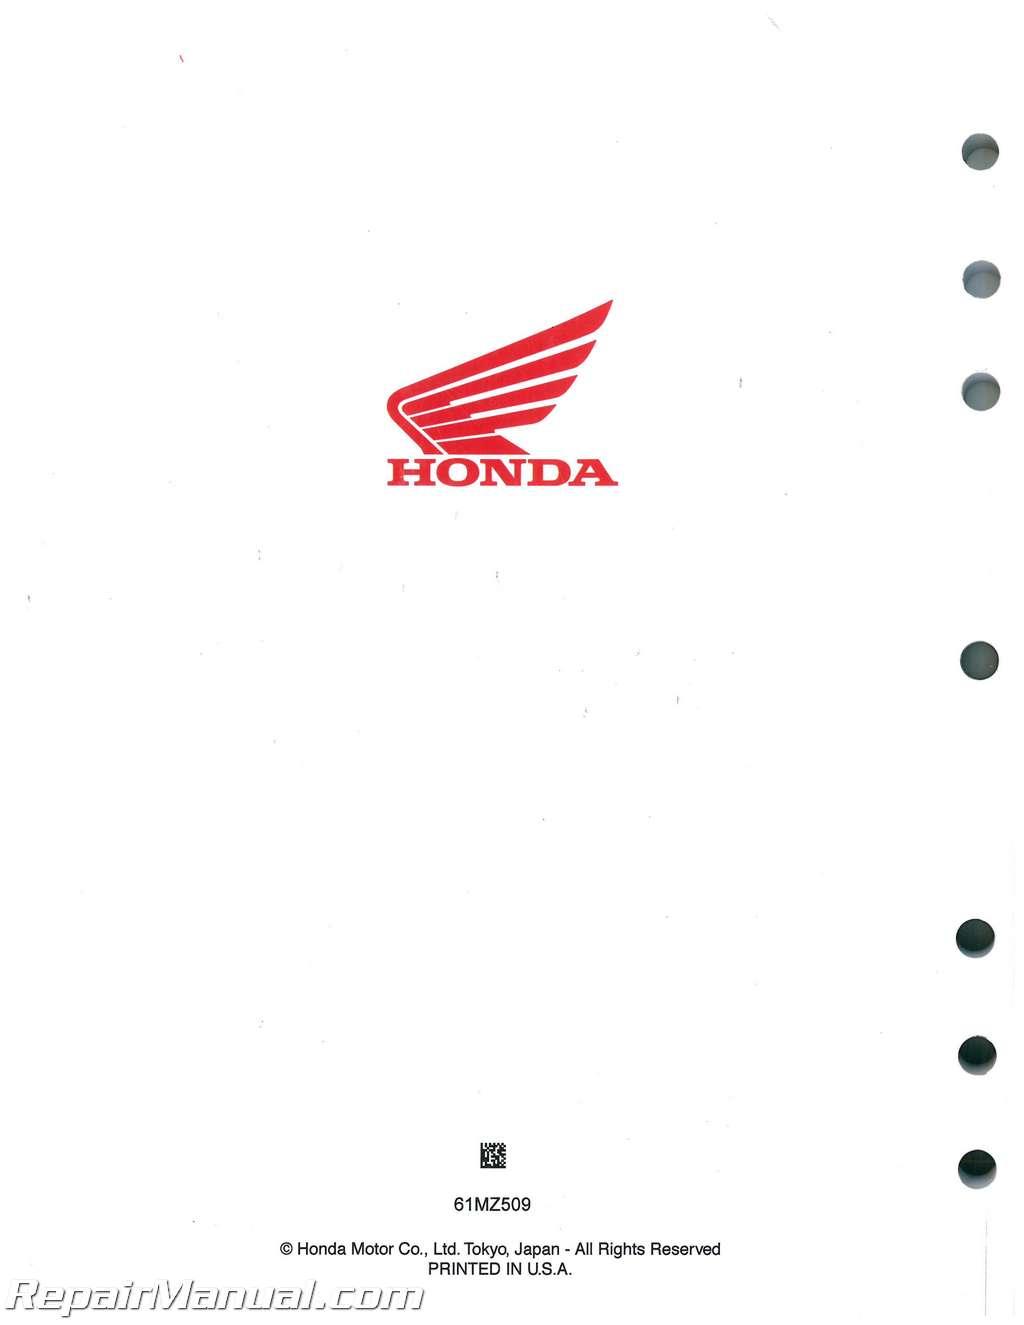 8283tour furthermore Official 1994 2003 Honda Vf750c Cd Magna Factory Service Manual 61mz509 also 2002 Honda Magna Vf750 Sportbike 55187 in addition 1985 Honda Vf1100c Magna V65 285539 additionally 1996 Honda Magna 750 Wiring Diagram. on 1995 honda vf750c magna